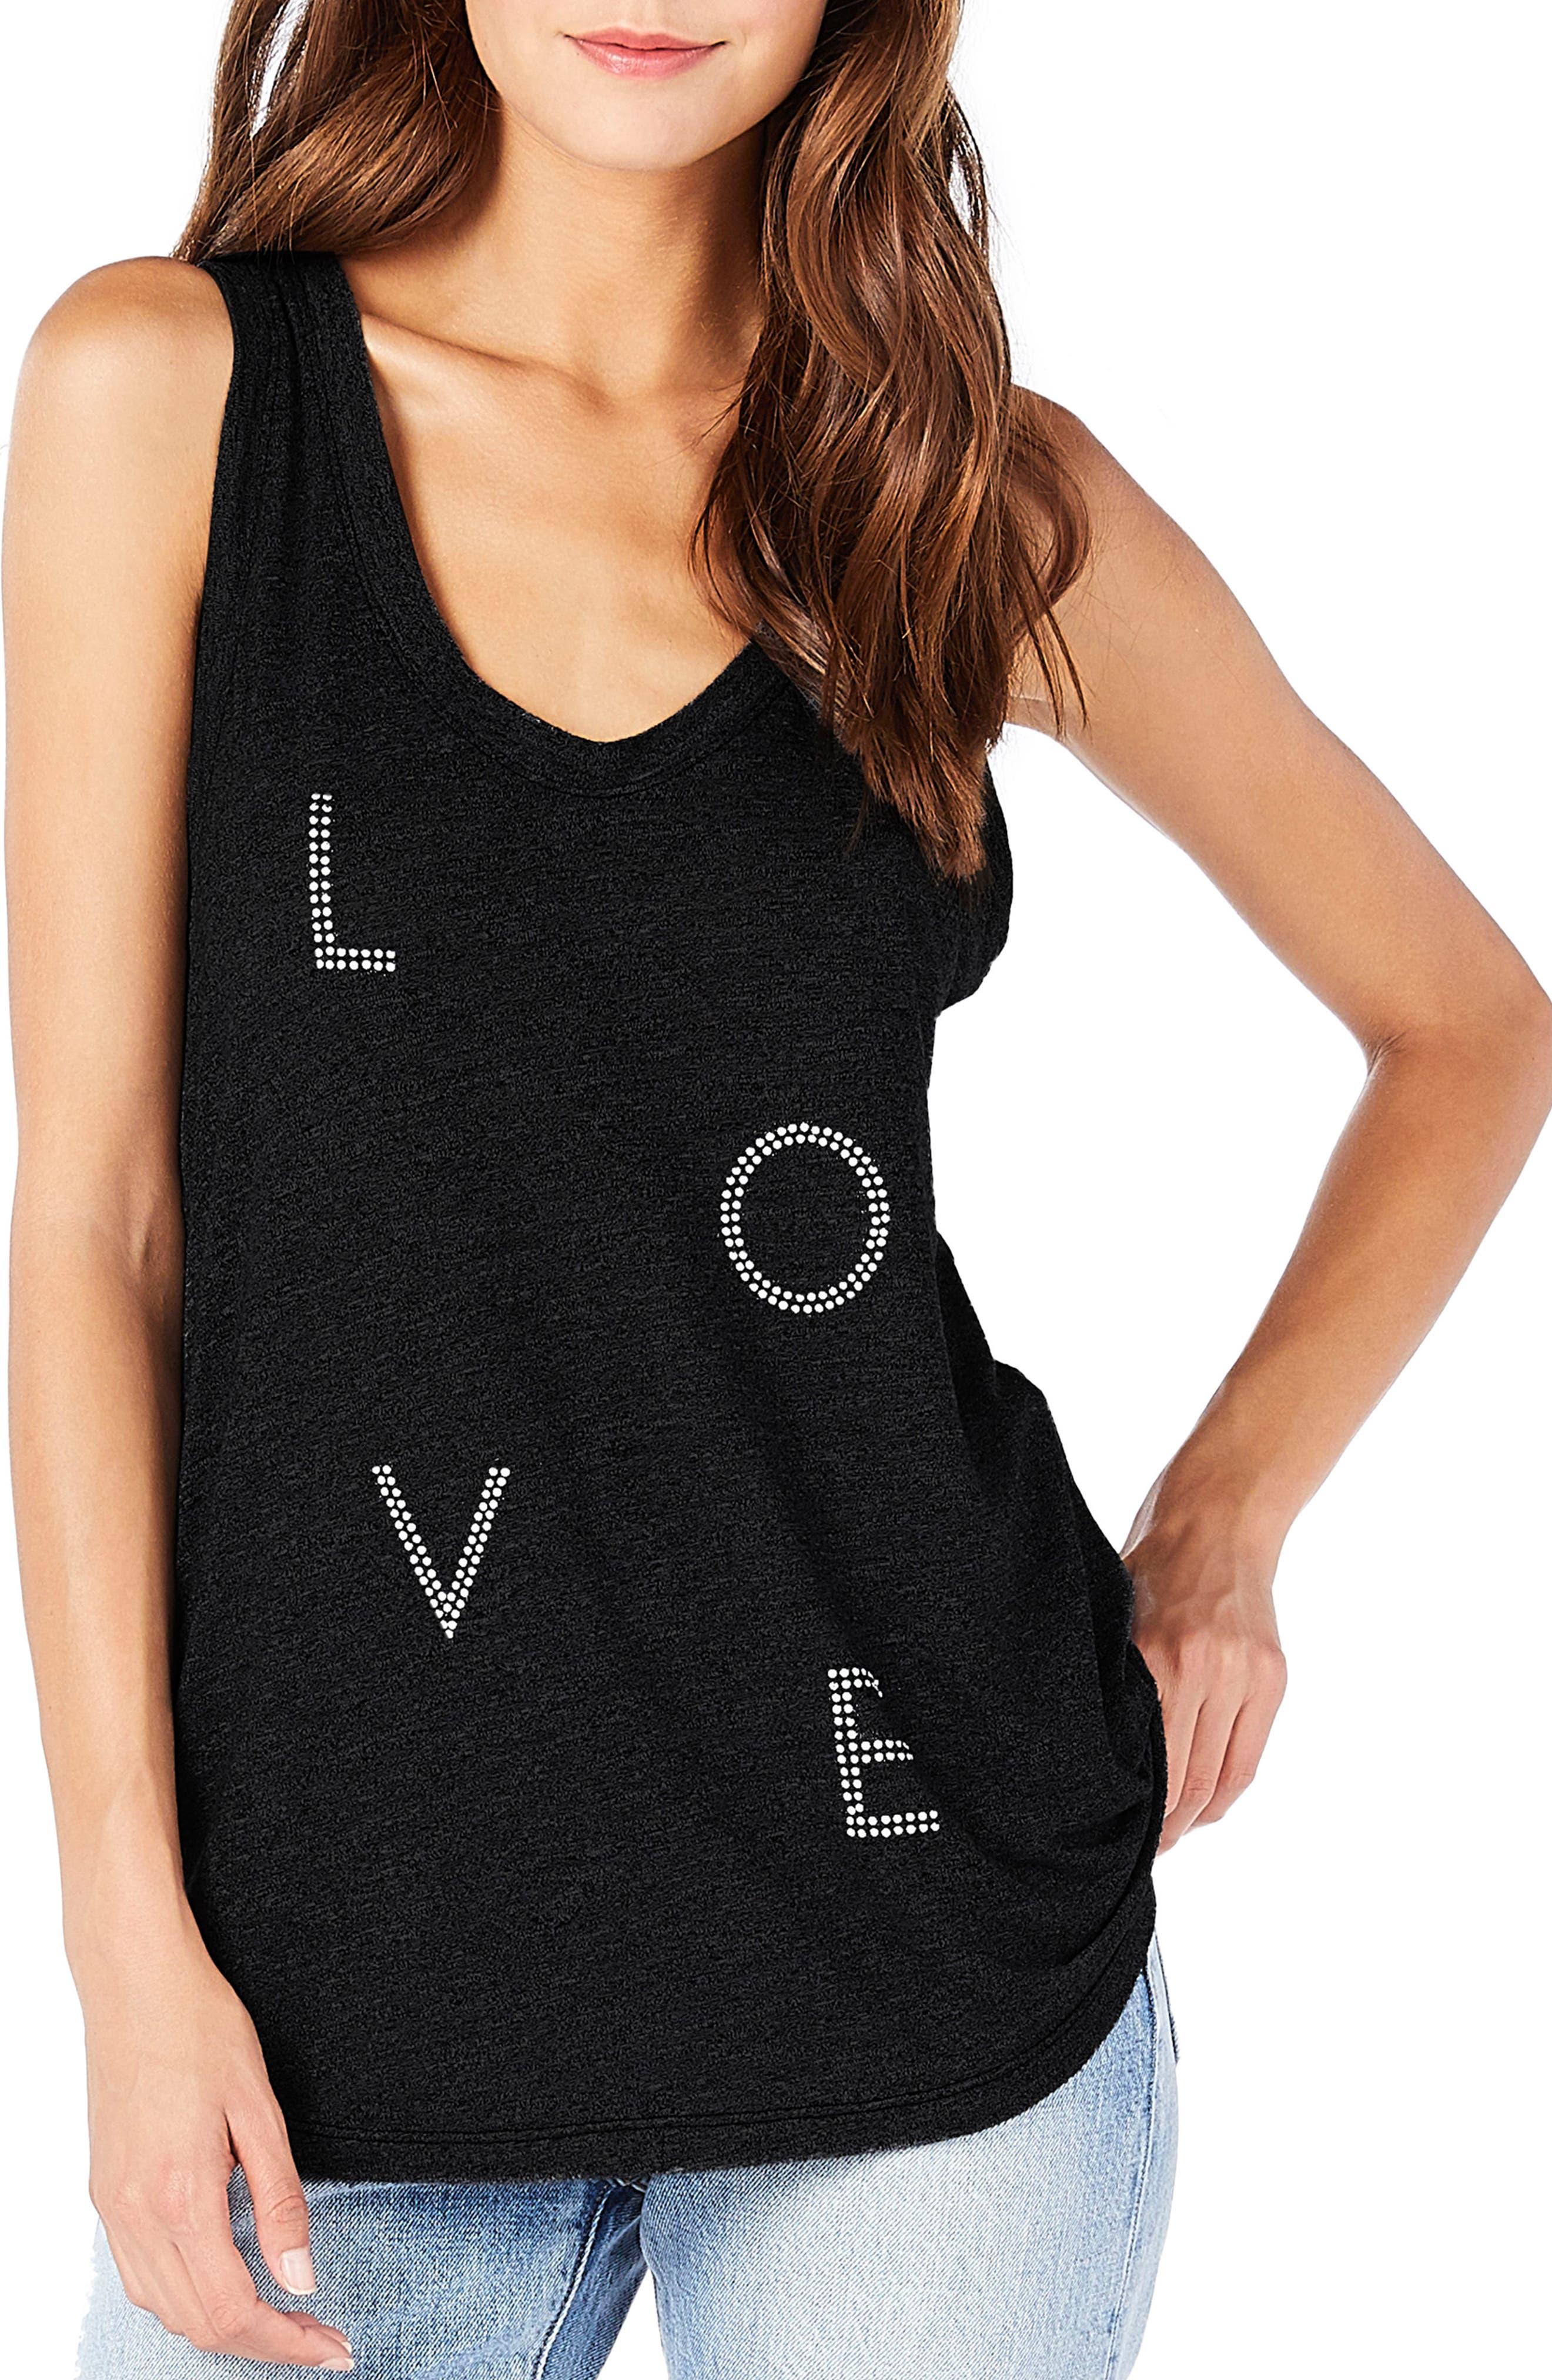 Love Tank Top,                         Main,                         color, Black